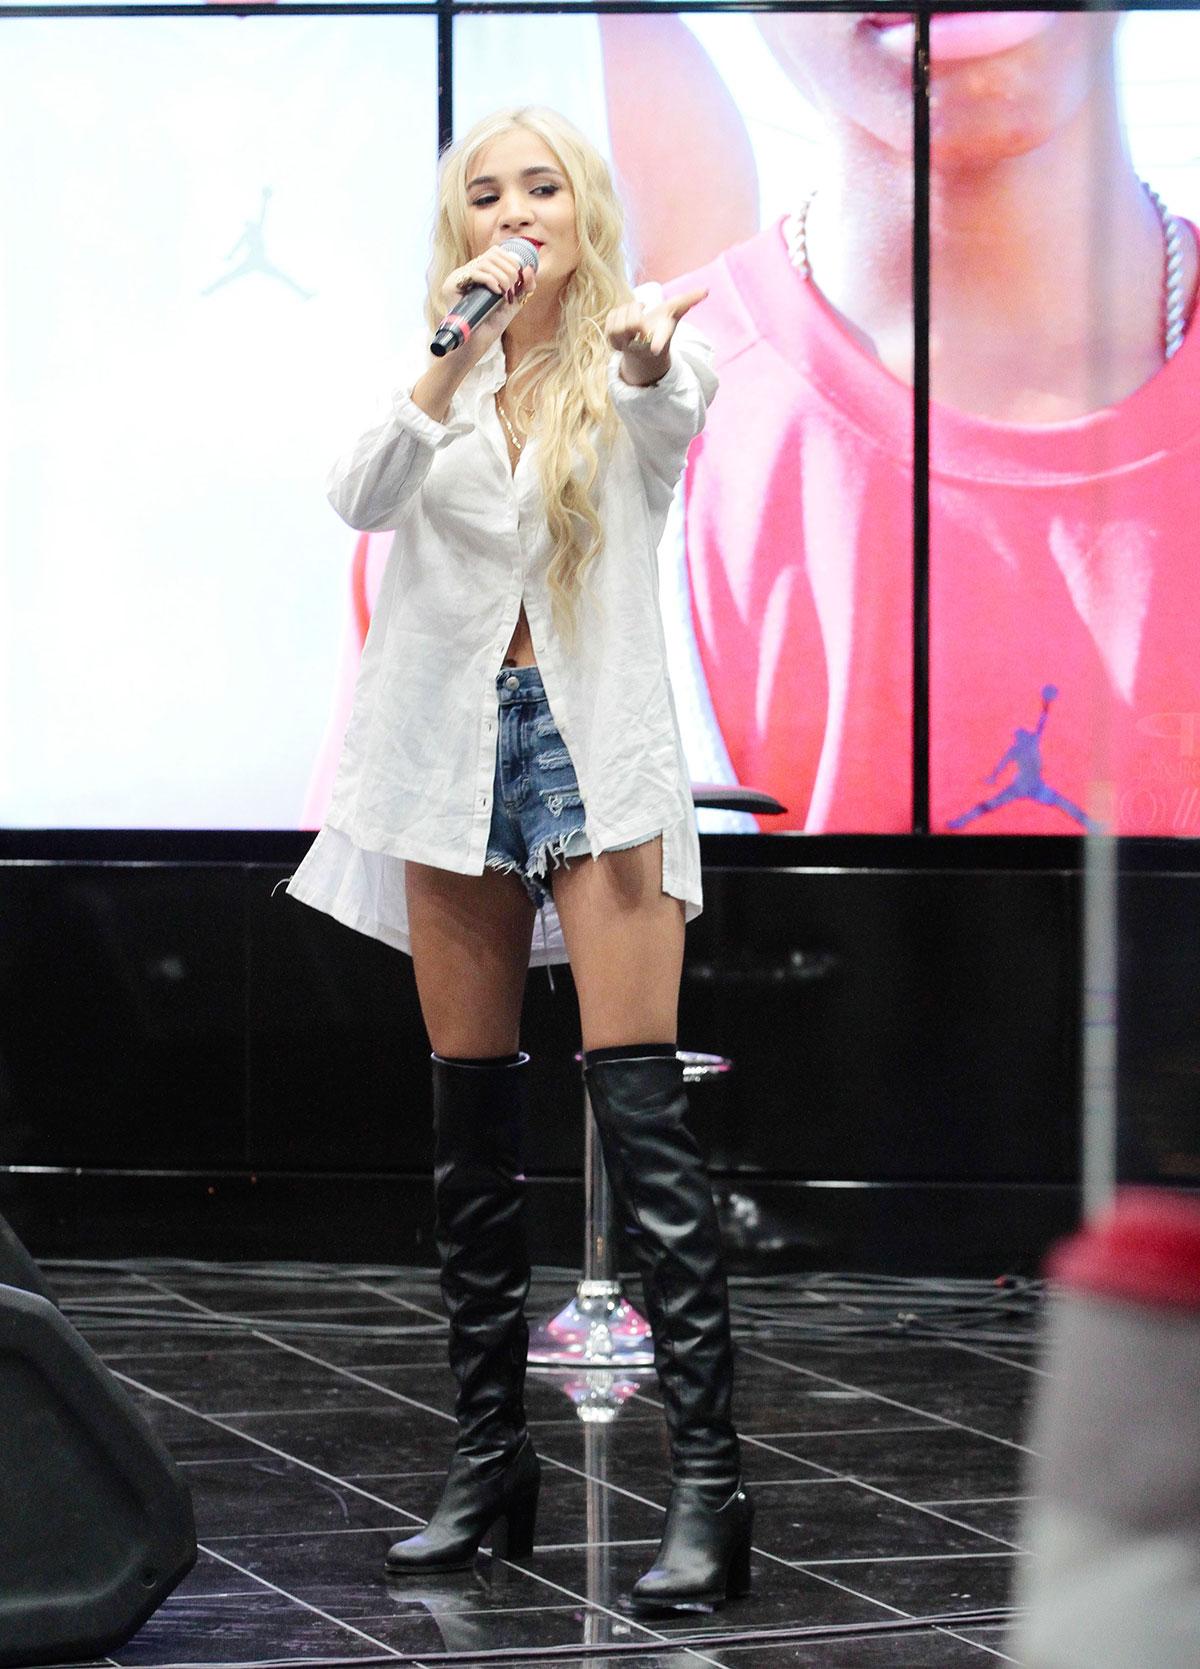 Pia Mia Perez performs at The Shoe Palace